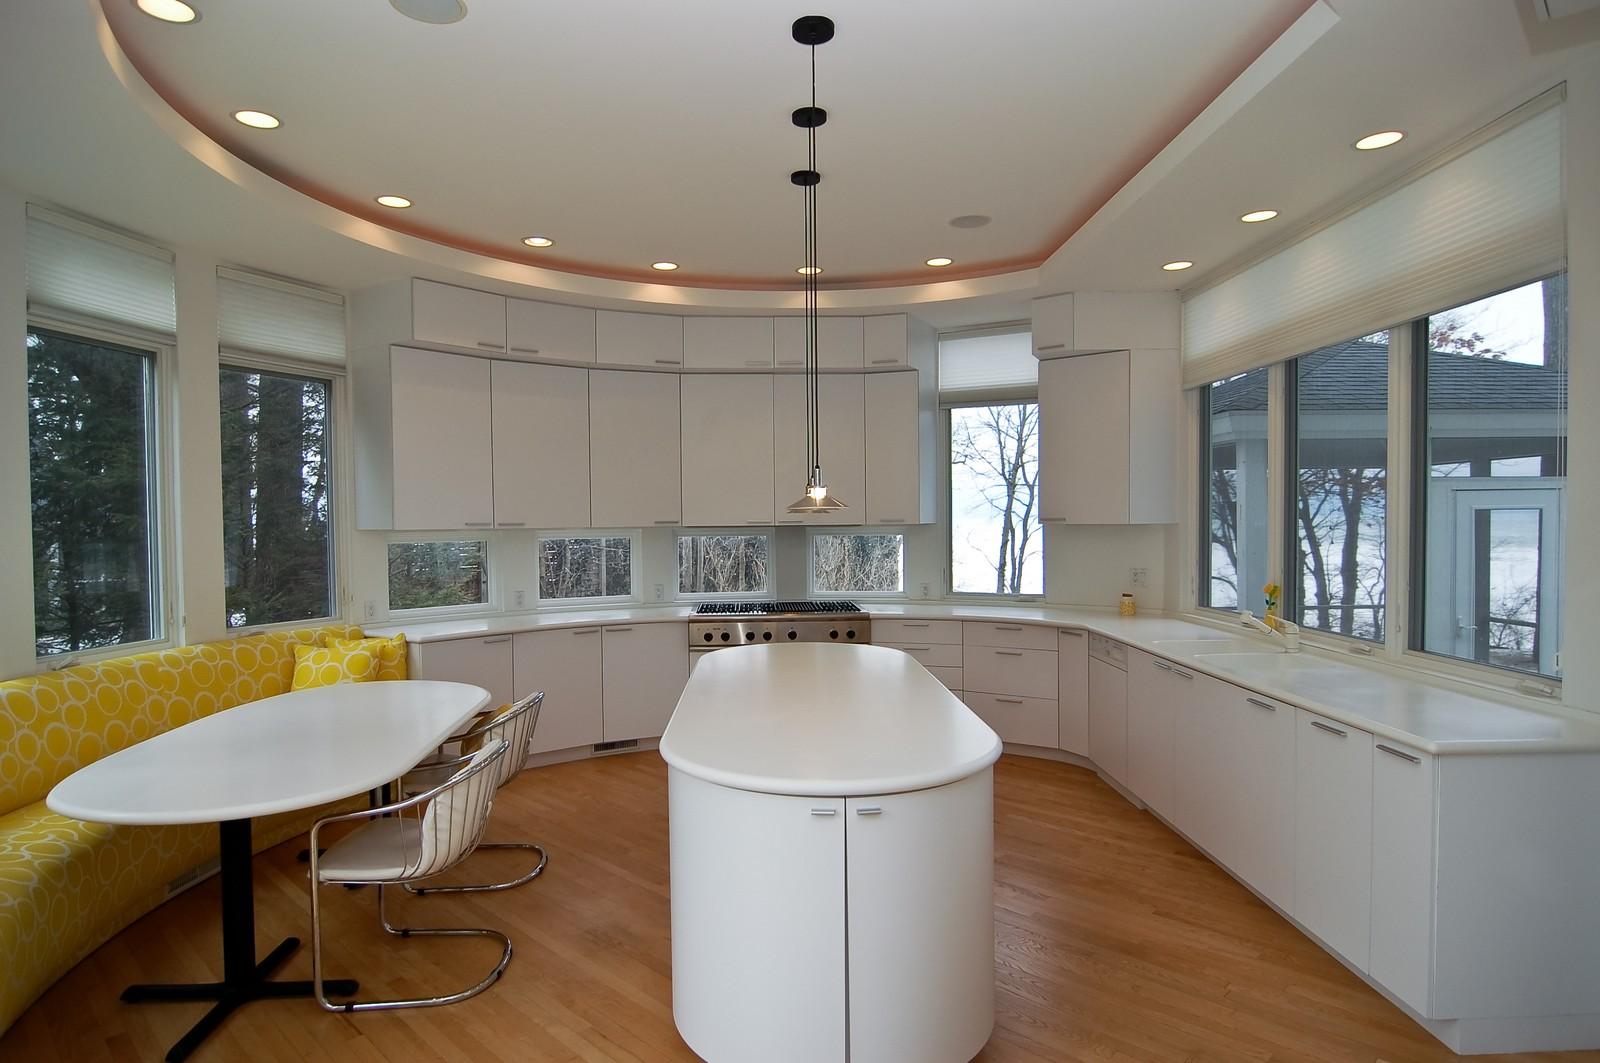 Real Estate Photography - 15930 Lake Ave, Union Pier, MI, 49129 - Kitchen